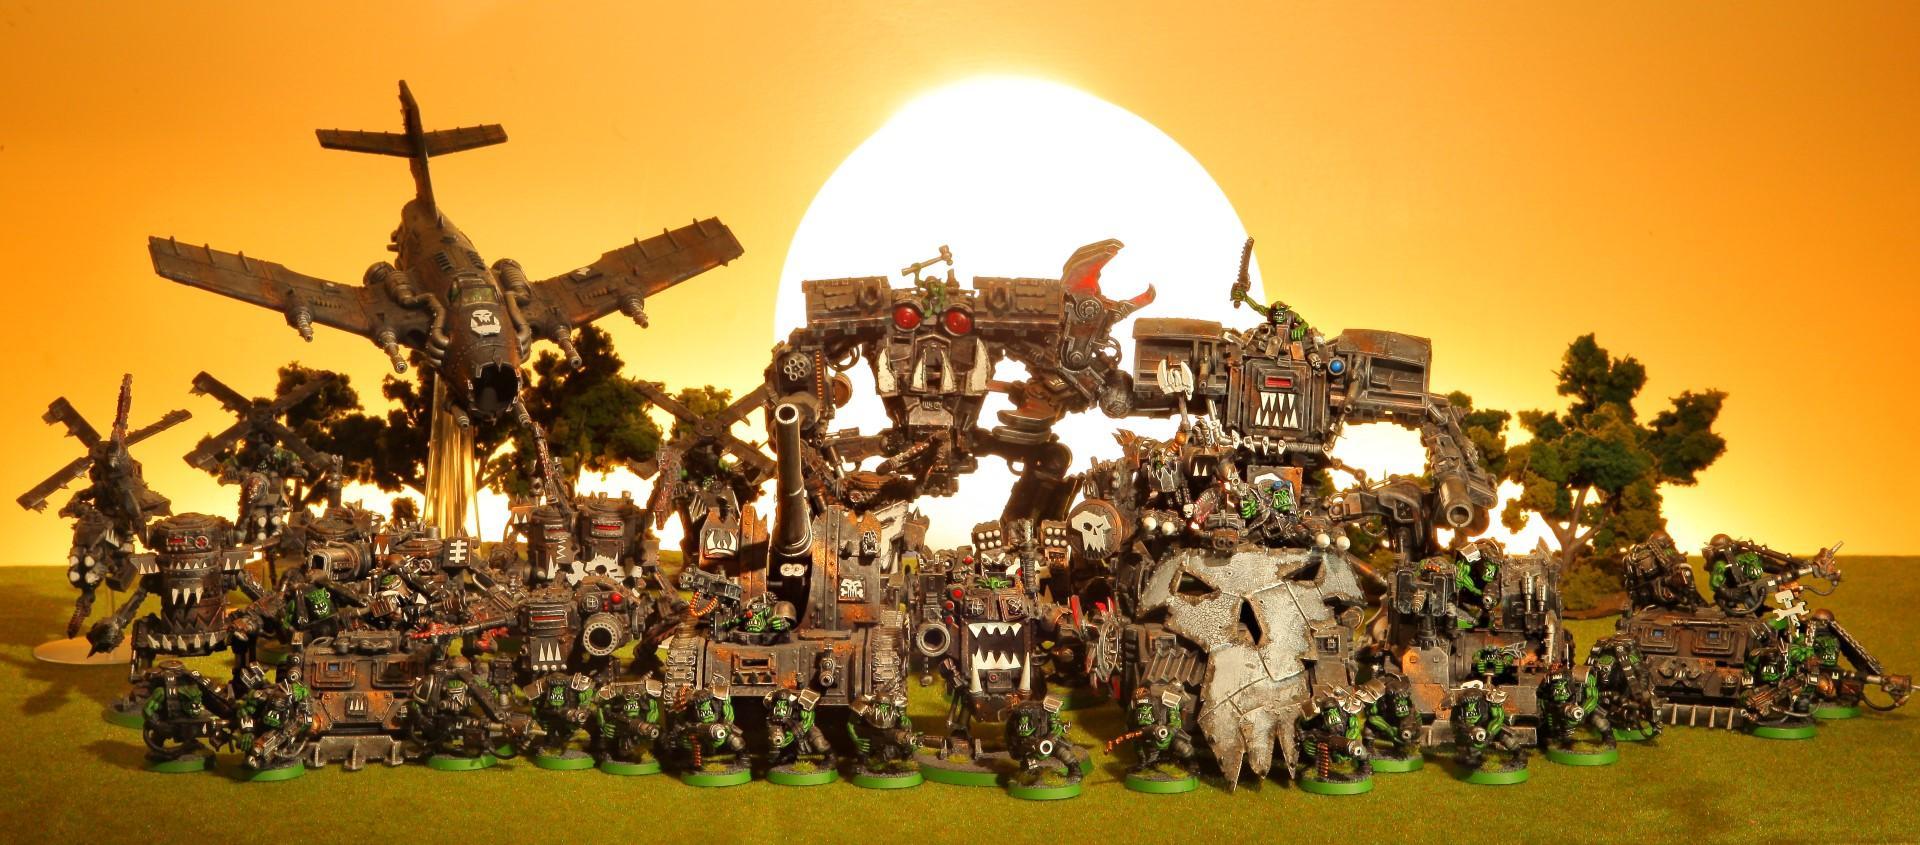 40k Orks, Big Mek, Big Meks, Big Trakk, Dakkajet, Deff Dread, Deff Dreads, Deff Mob, Deffkopta, Domo Kan, Domokan, Forgeworld Dread Mob, Gretchin, Grots, Killa Kan, Mega Dread, Mega Dreads, Mekboy, Ork Army, Ork Dread Mob, Orks, Painted Ork Army, Spanner Boy, Spanner Boyz, Warhammer 40k Orks